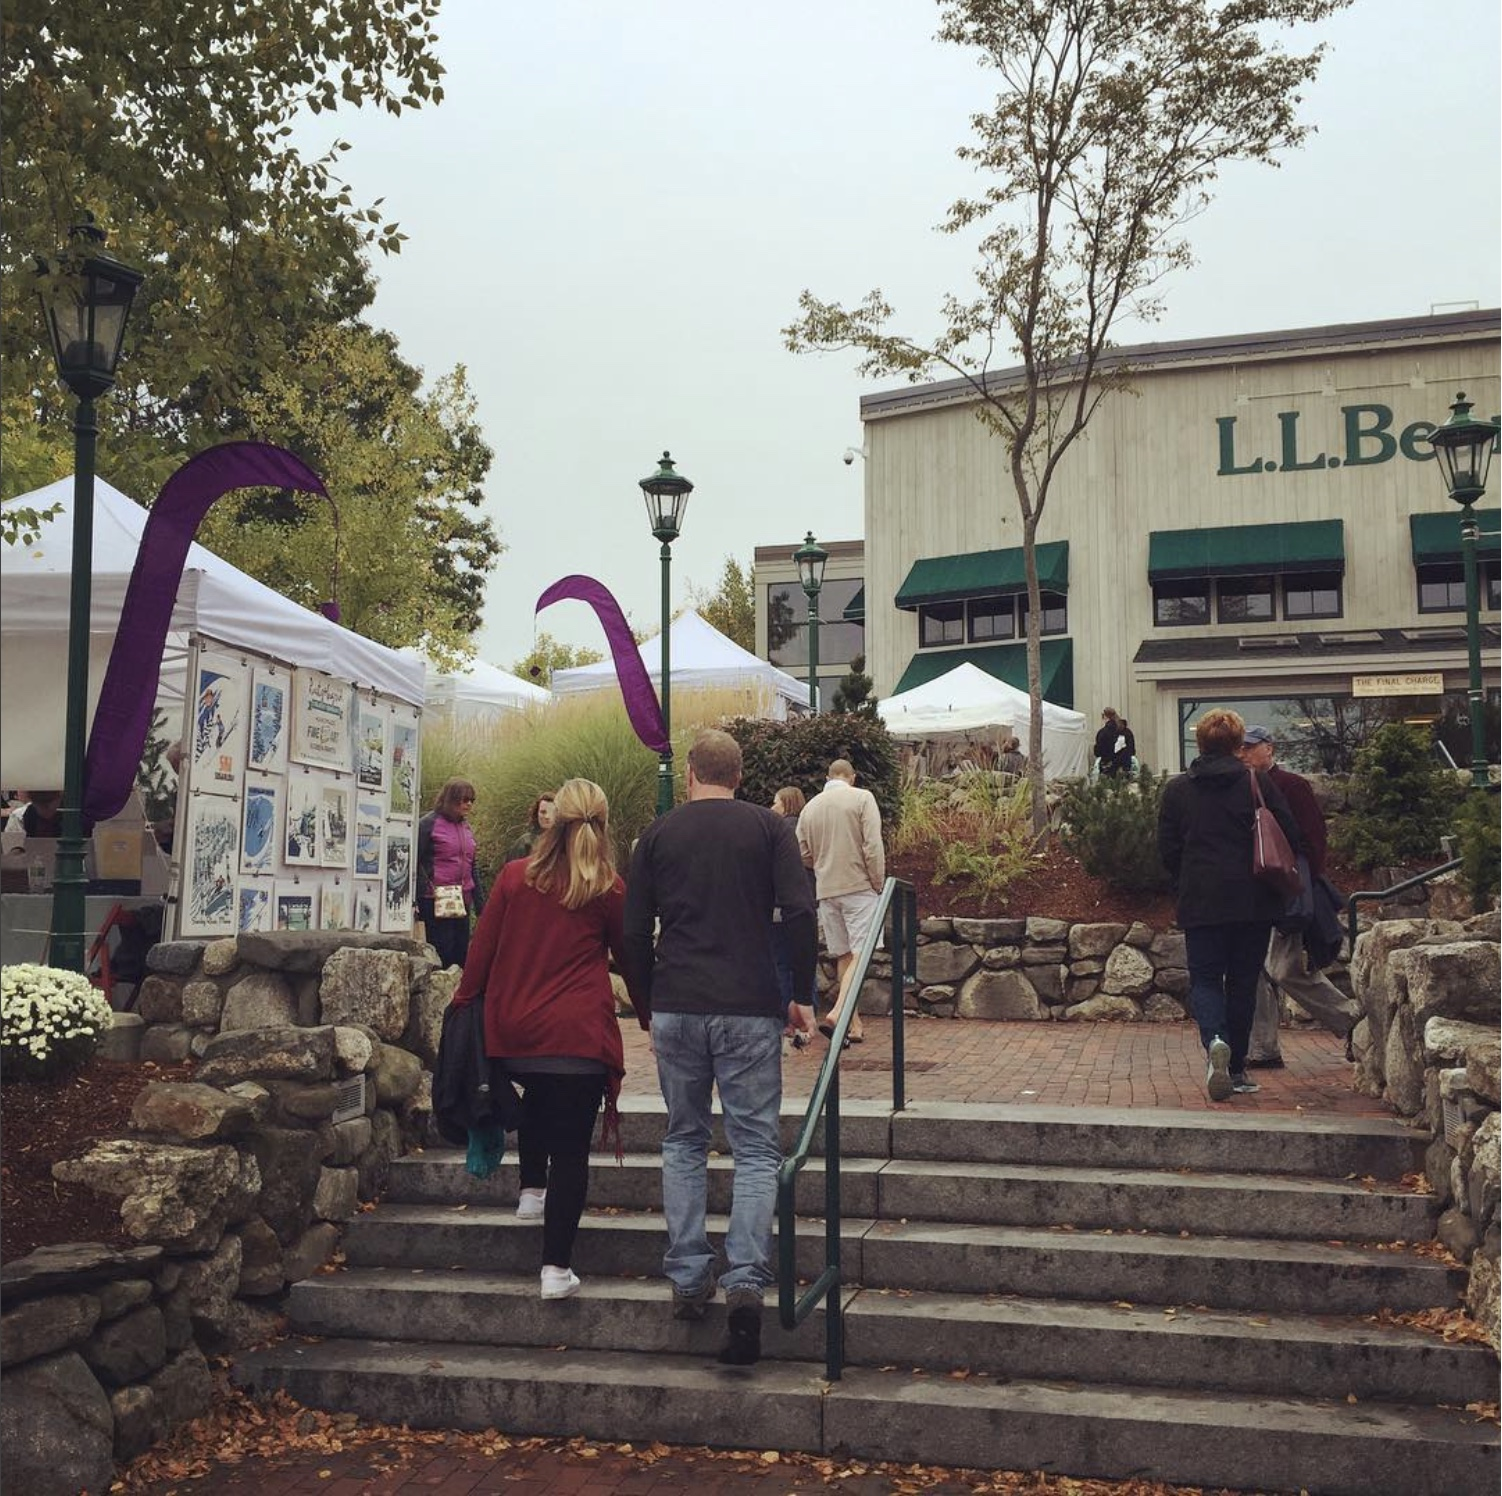 Freeport Fall Festival, Freeport, Maine